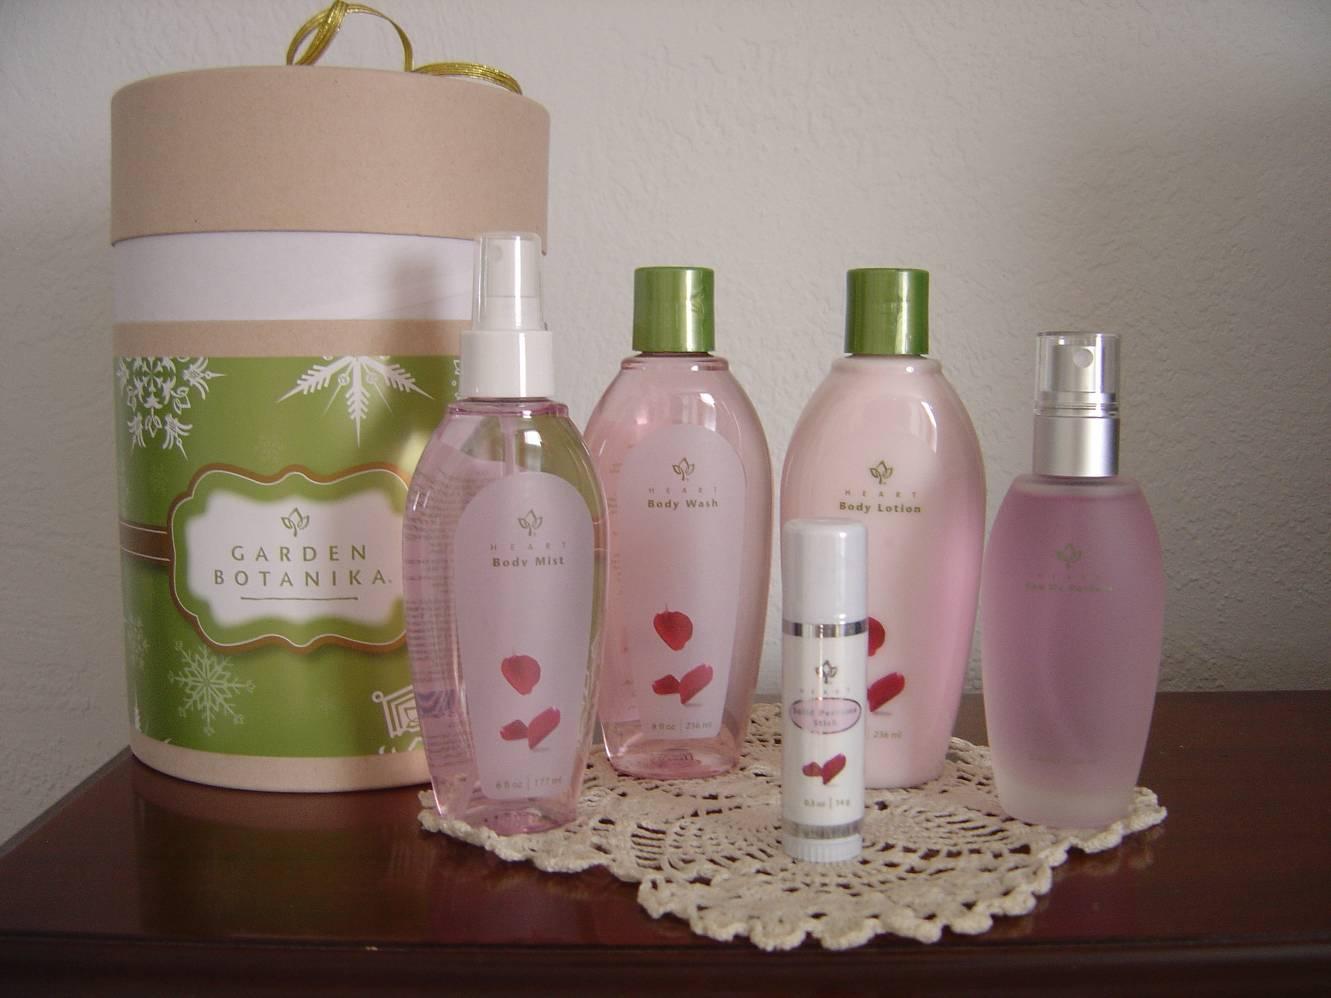 Garden Botanika Winter Romance Heart Gift Collection